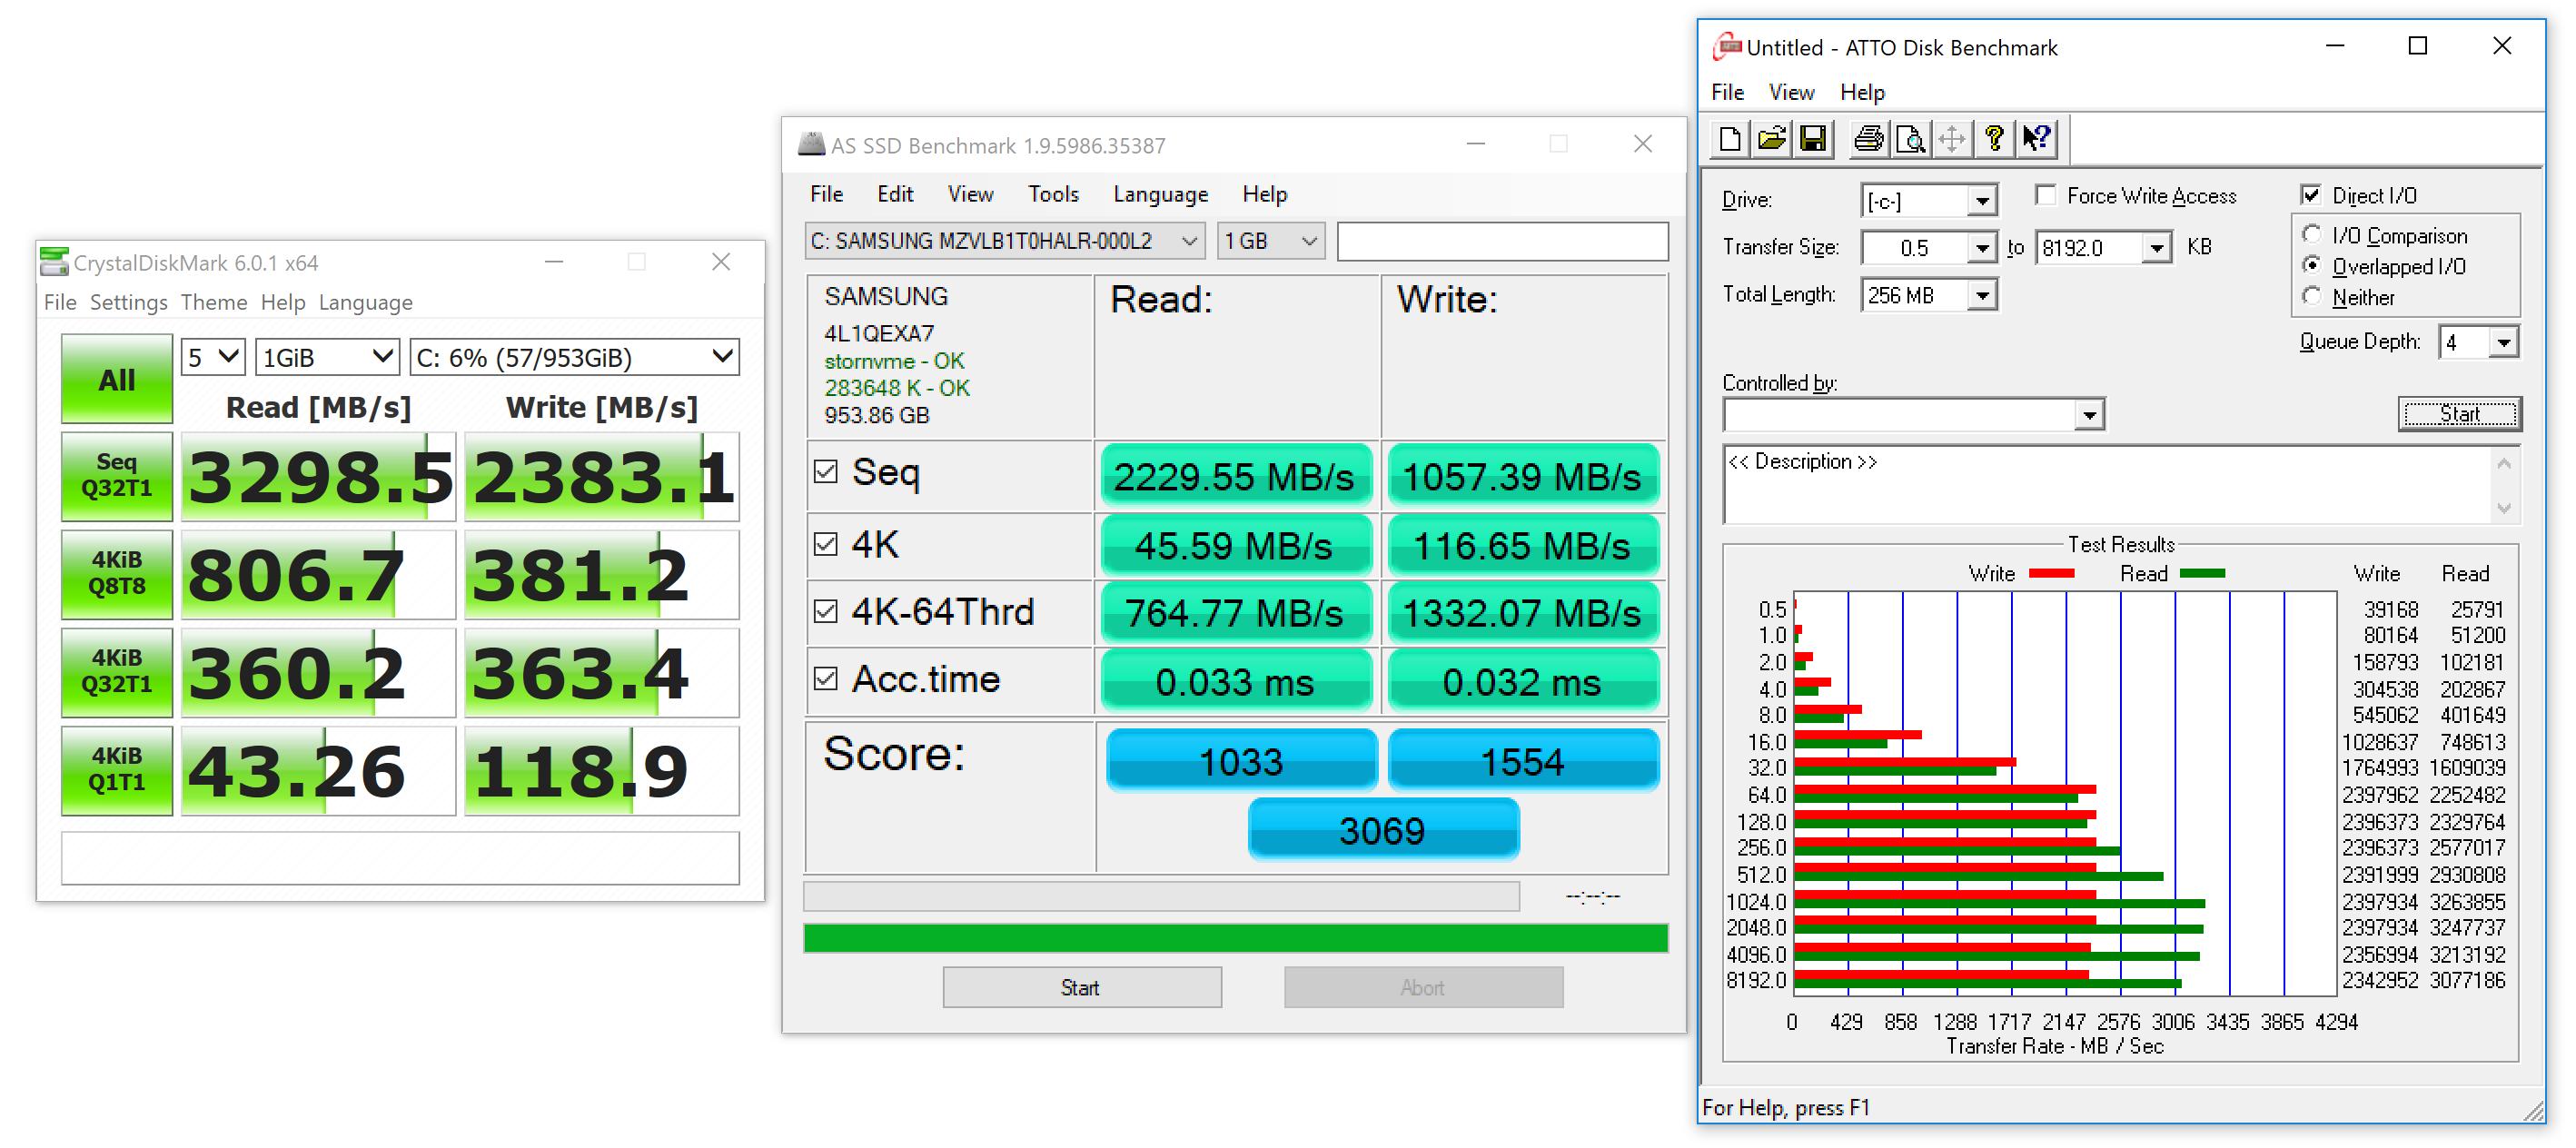 Lenovo Yoga C930 review (i7-8550U, 16 GB RAM, UHD screen)